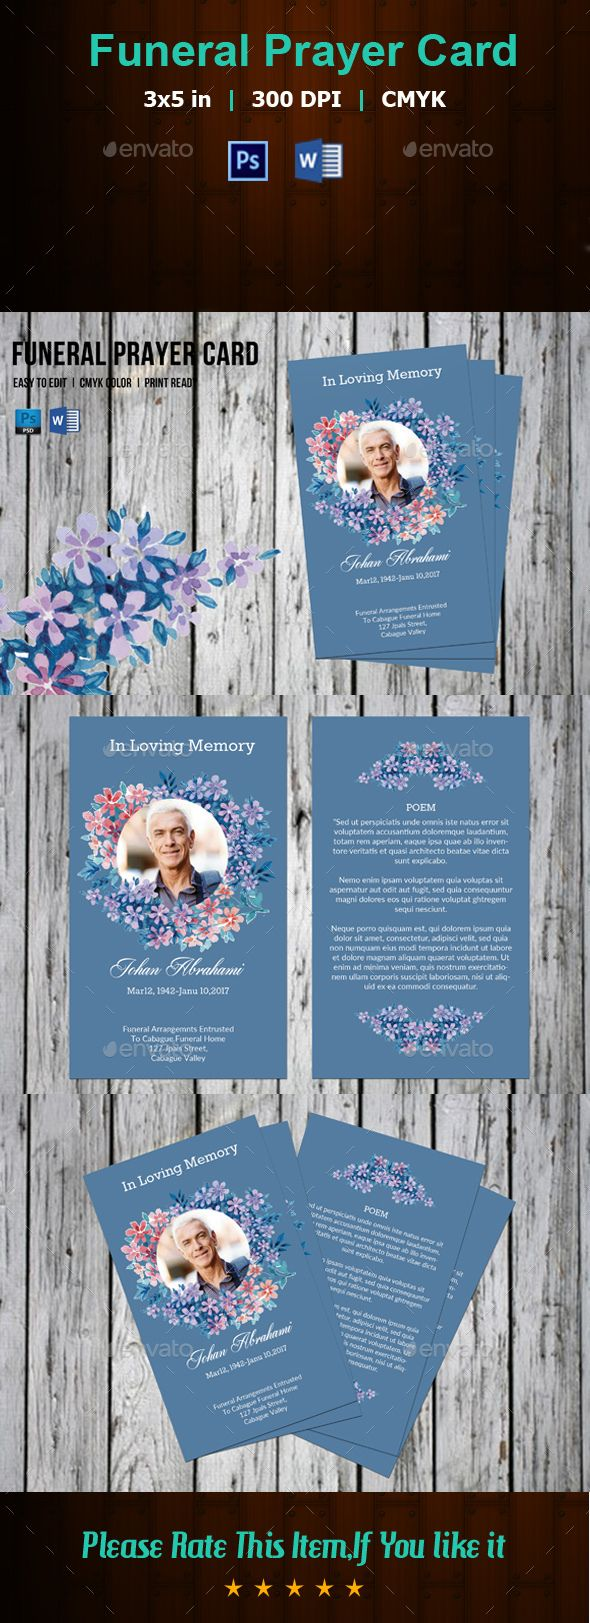 Funeral Prayer Card Template-V174 - Church Flyers